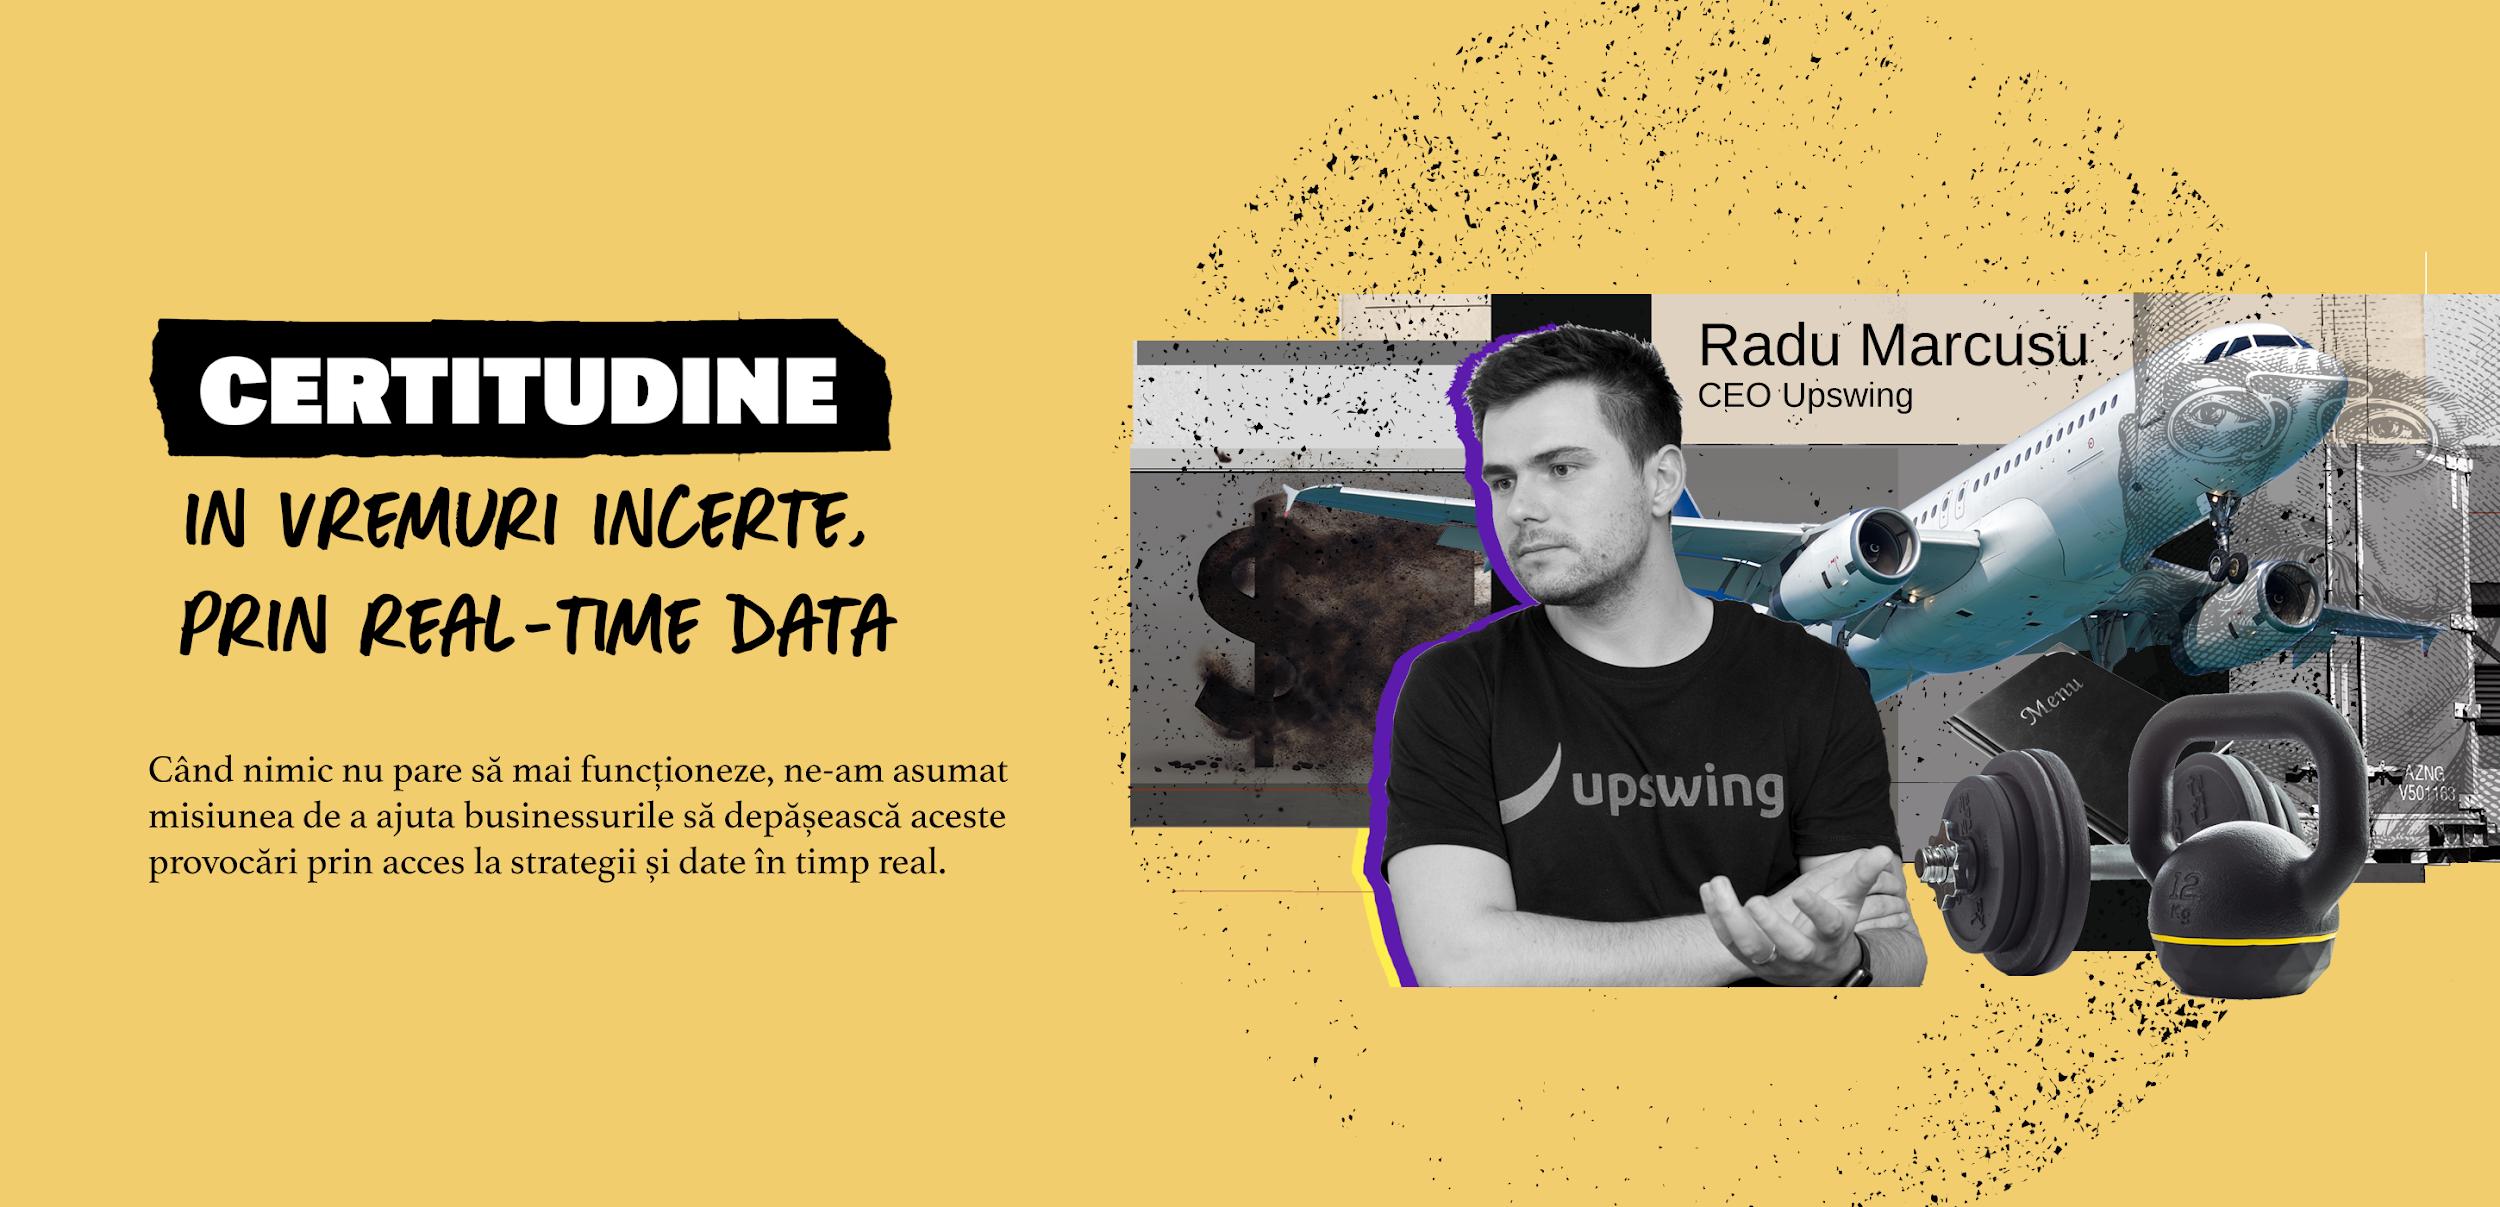 Webinar: Radu Marcusu, CEO Upswing aduce certitudine in vremuri incerte, prin date in timp real